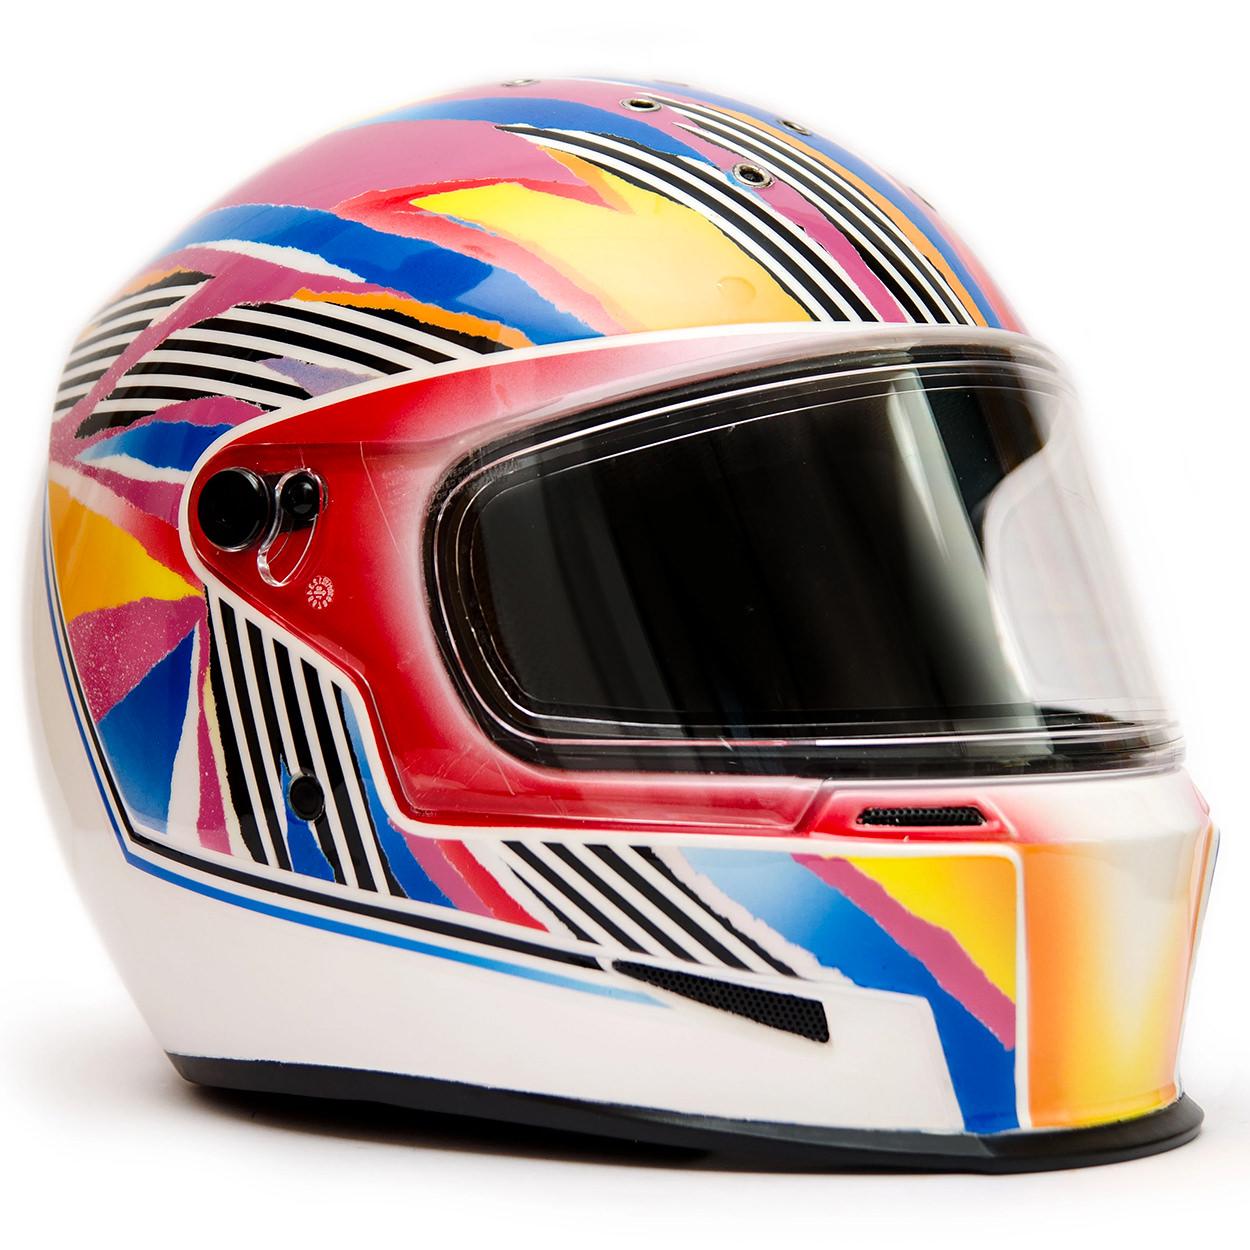 Custom motorcycle helmet by designer Viktoria Grenier, founder of Vaim.me